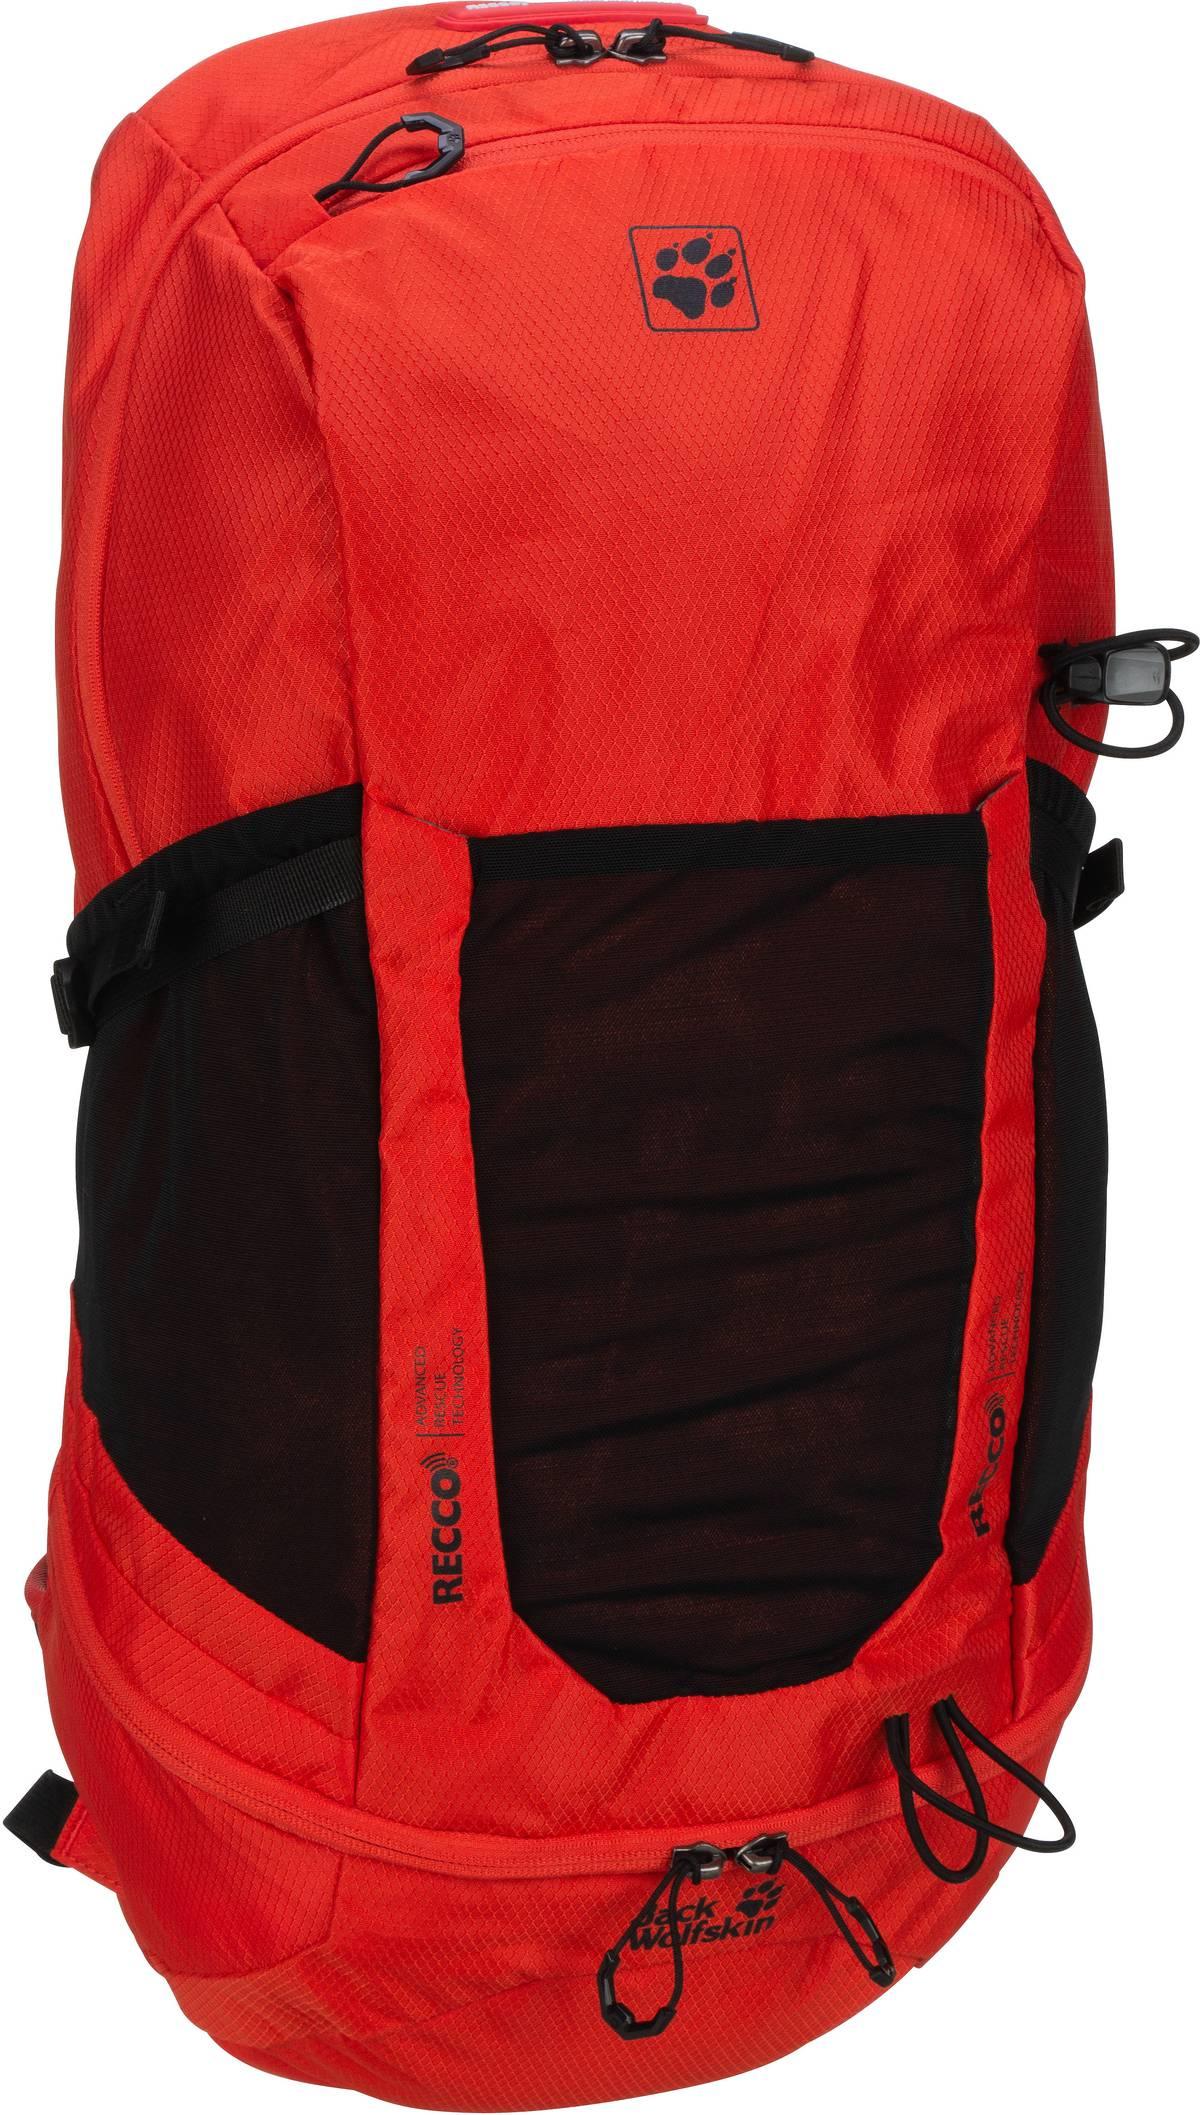 Wanderrucksack Kingston 30 Pack Recco Lava Red (30 Liter)